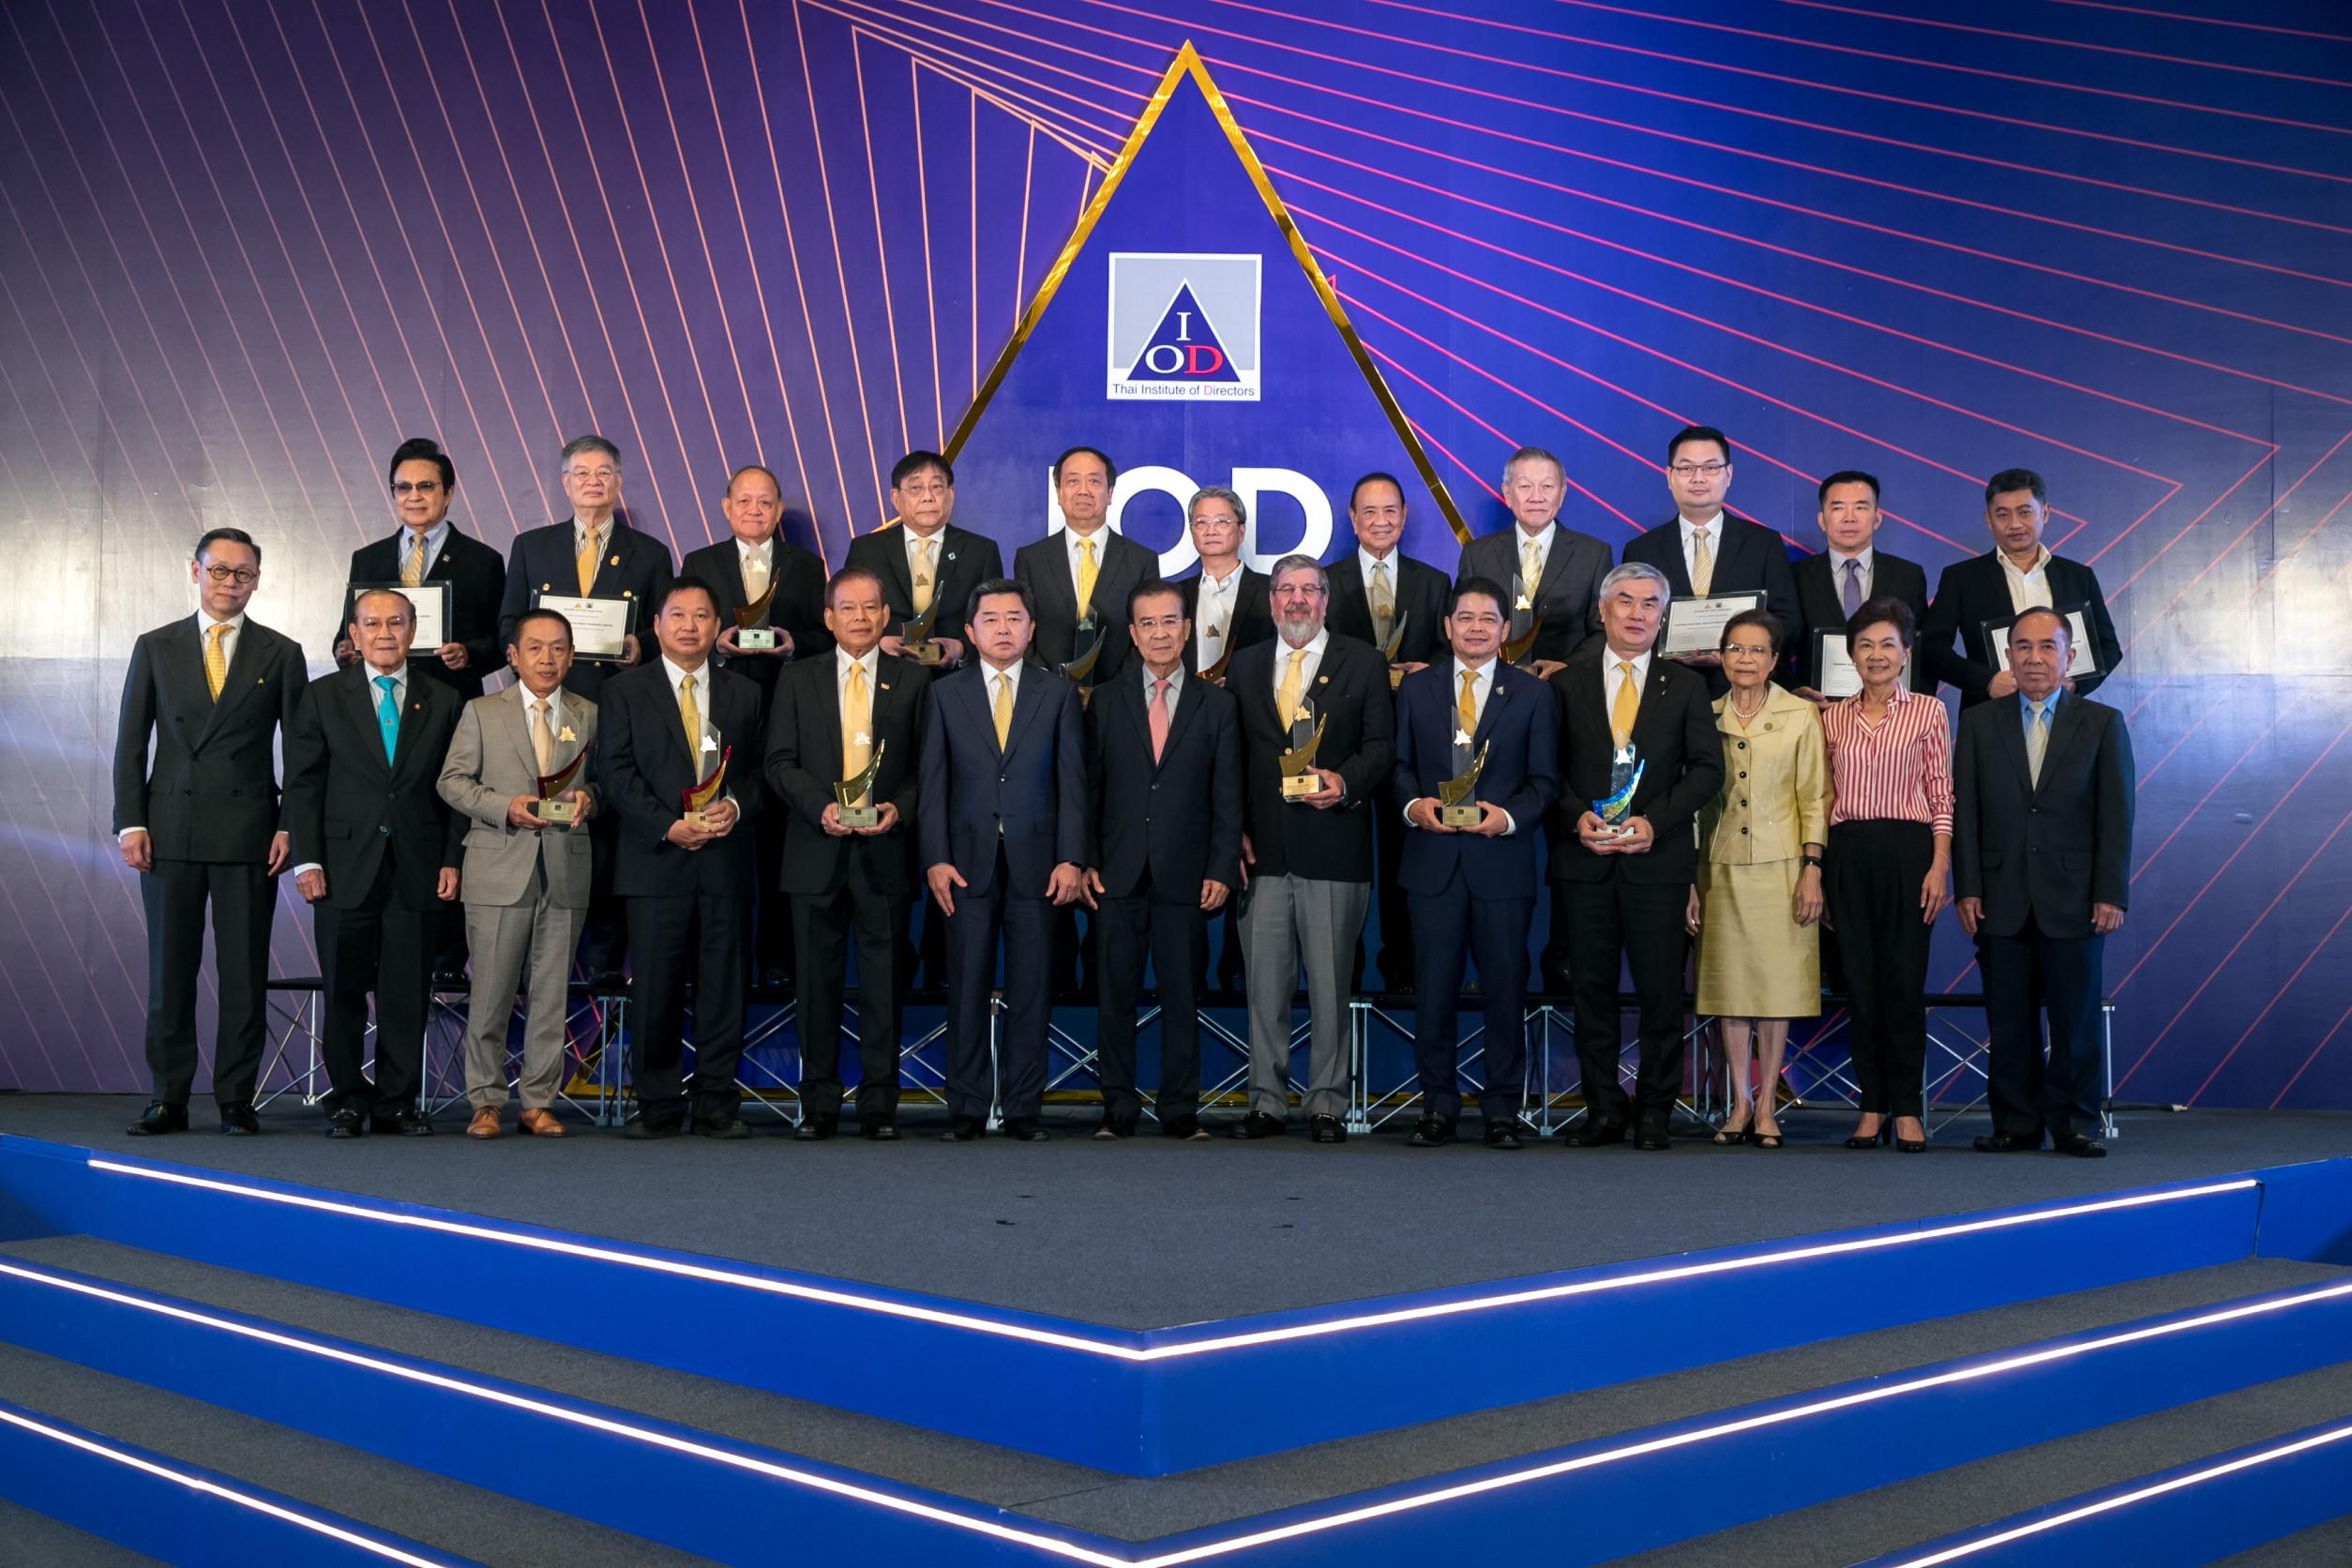 IOD ประกาศผลรางวัล Board of the Year ในงานใหญ่ประจำปี National Director Conference 2019